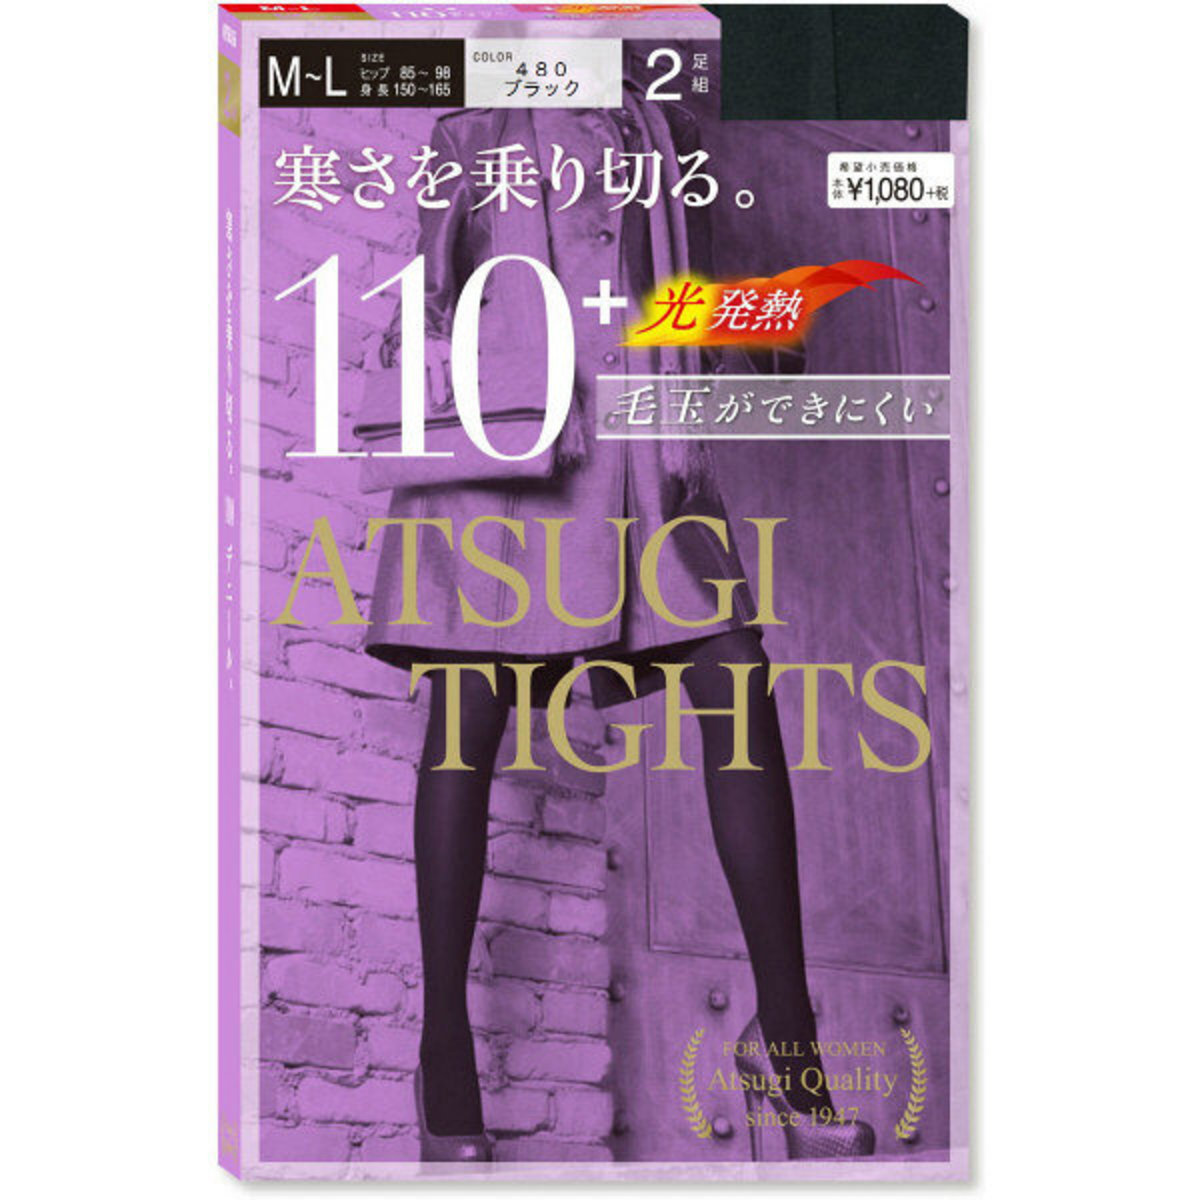 ATSUGI -  Optical Heat-Generating Tights, 2-Pair Set, 110 Denier, M-L Black 【Parallel Import Product